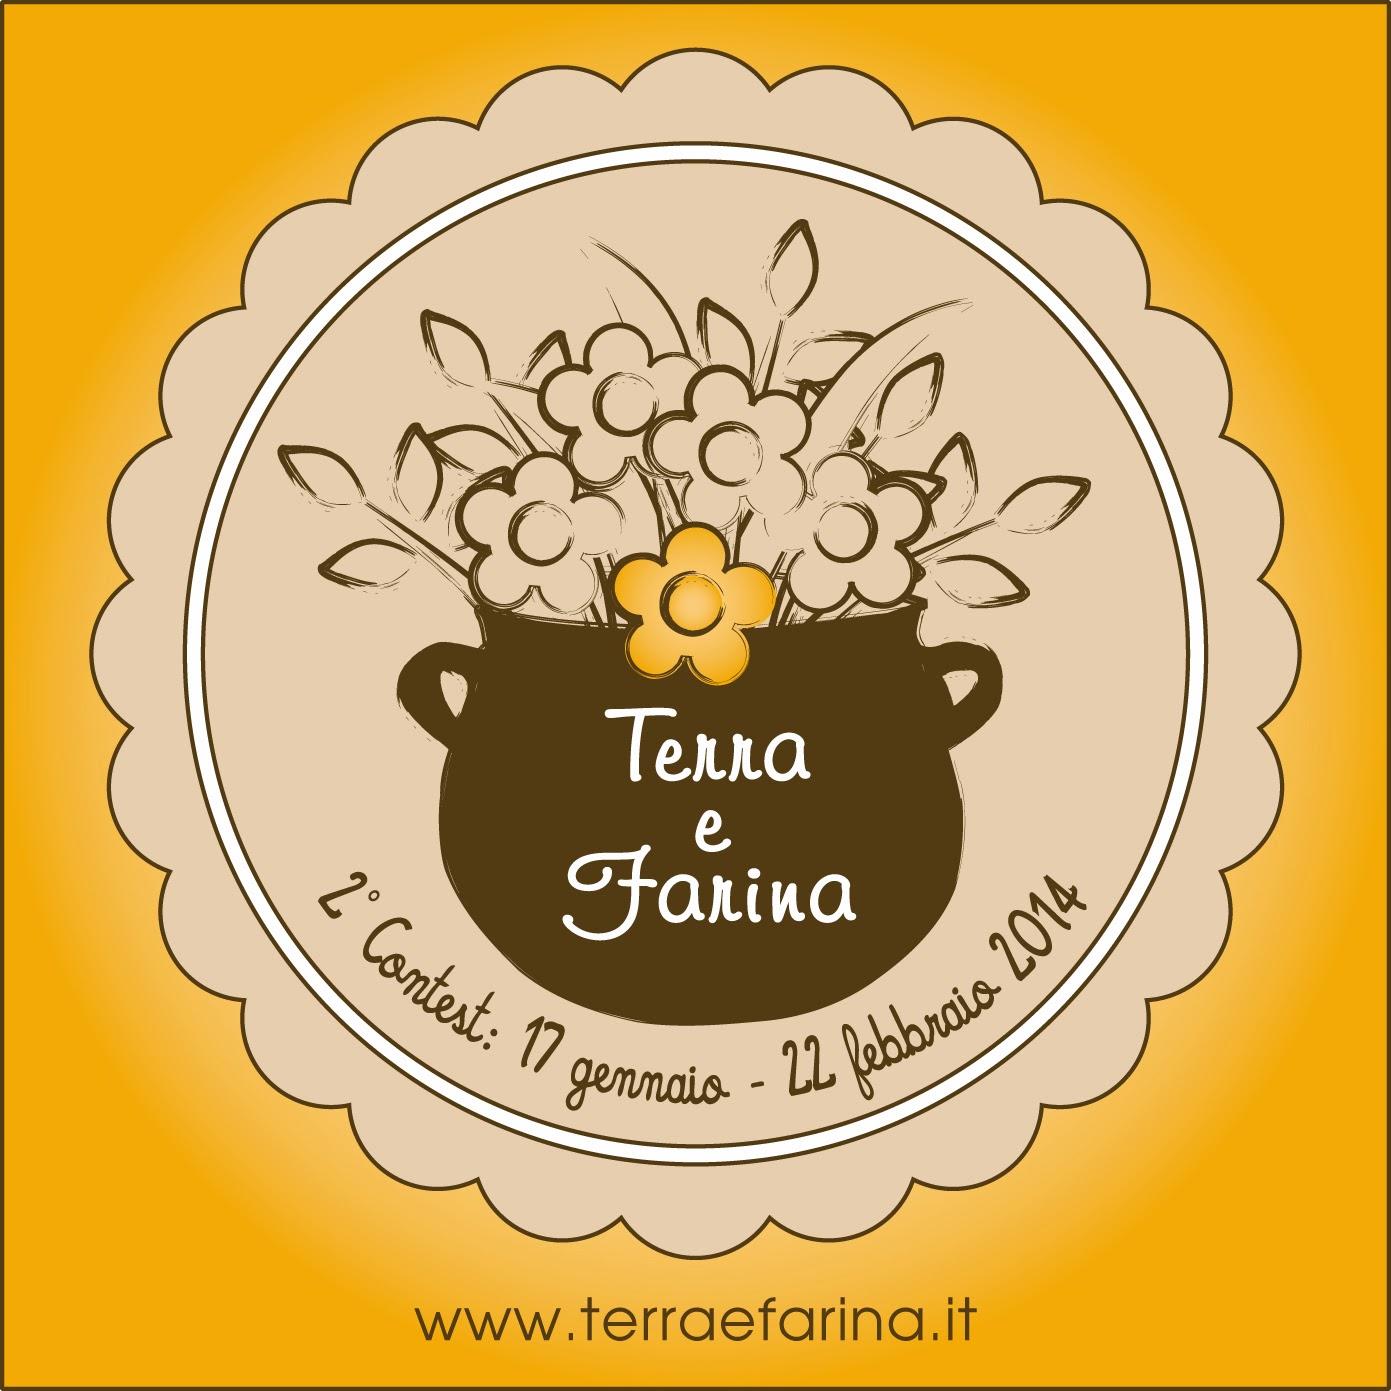 http://www.terraefarina.it/2014/01/2-contest-terra-e-farina.html